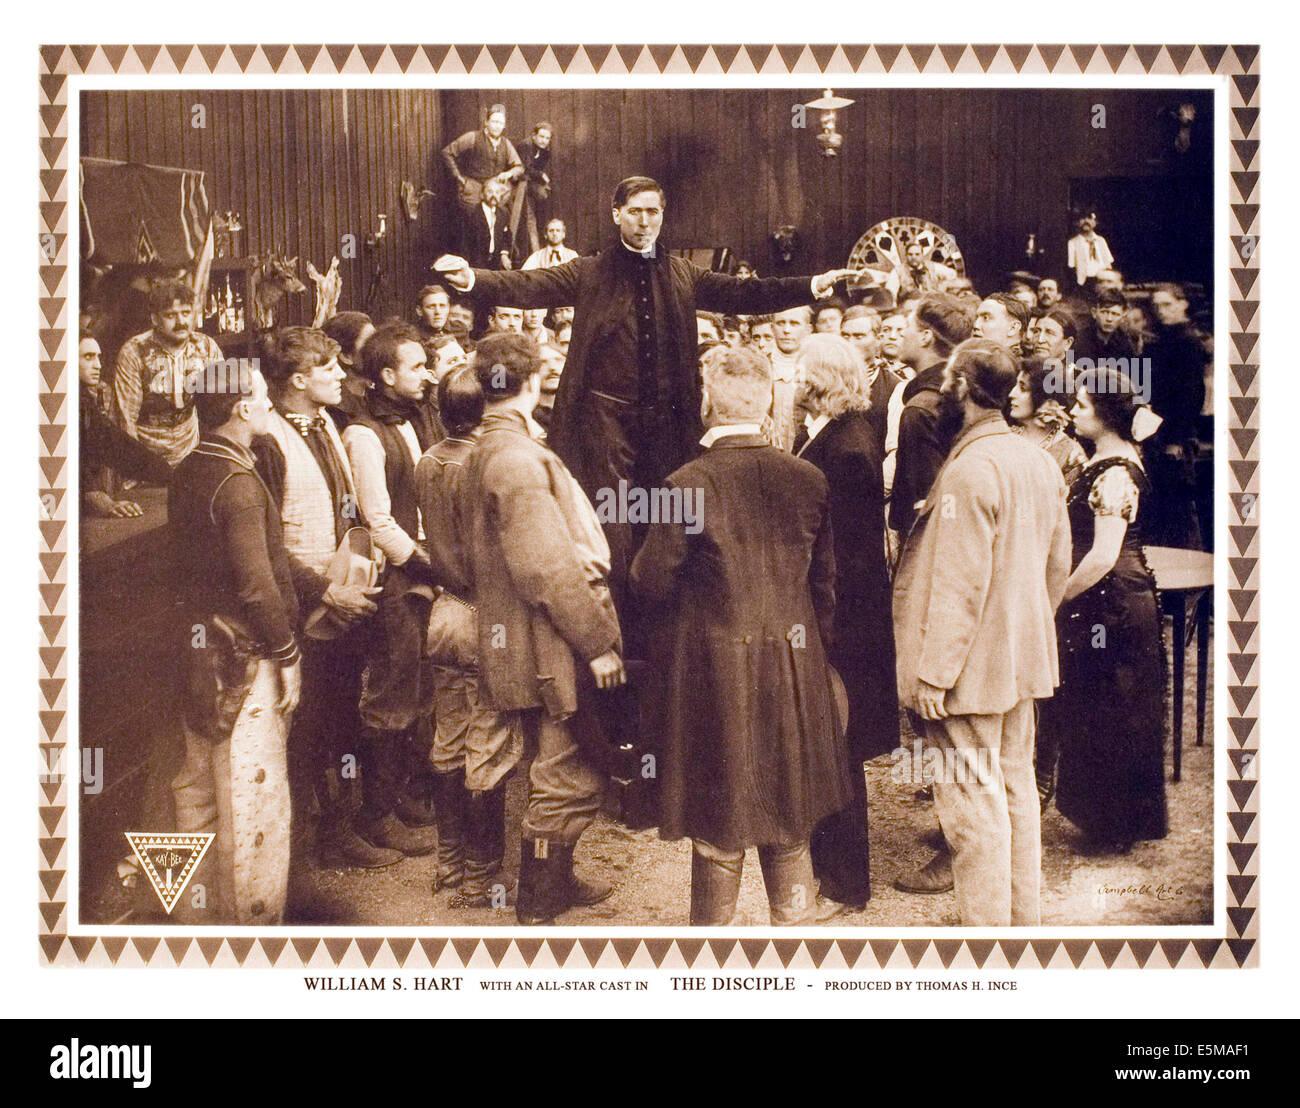 THE DISCIPLE, William S. Hart, 1915. - Stock Image